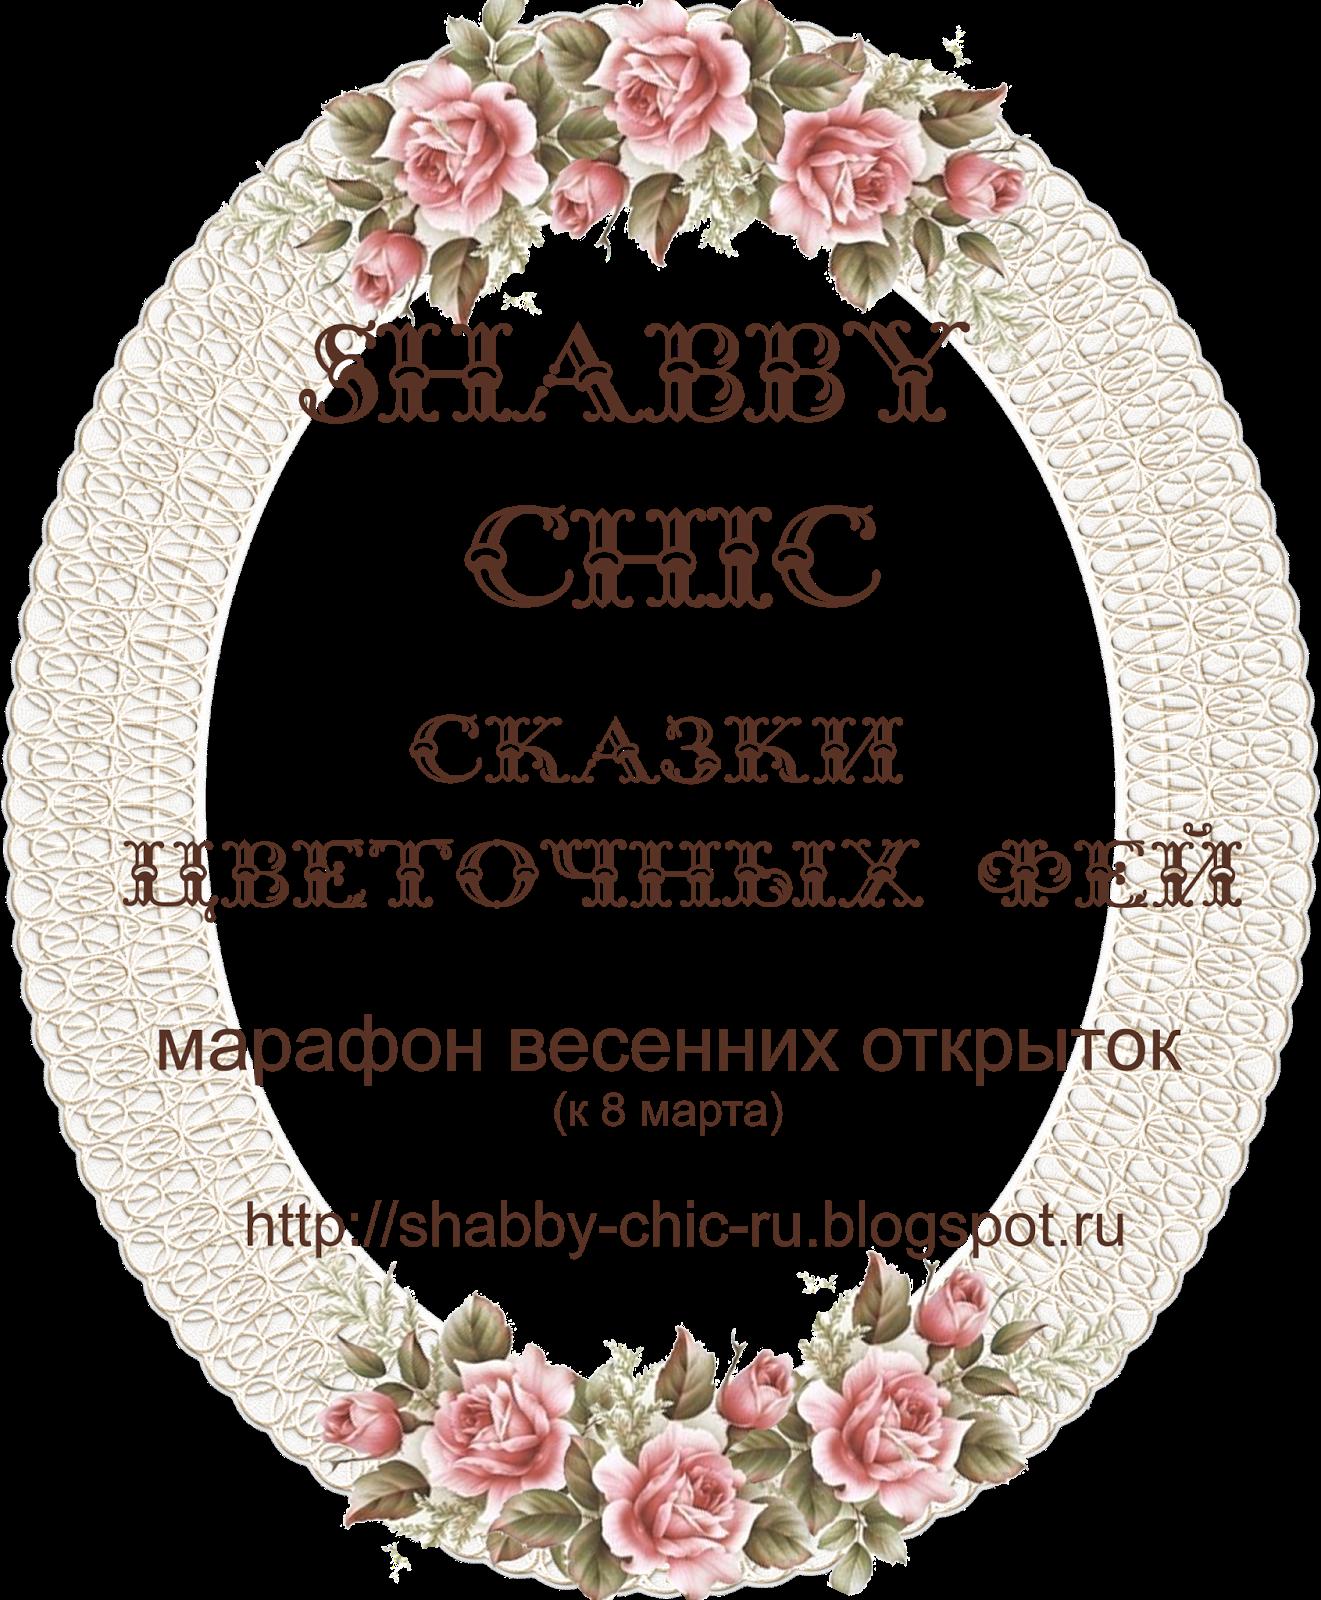 http://shabby-chic-ru.blogspot.ru/2015/01/8_30.html